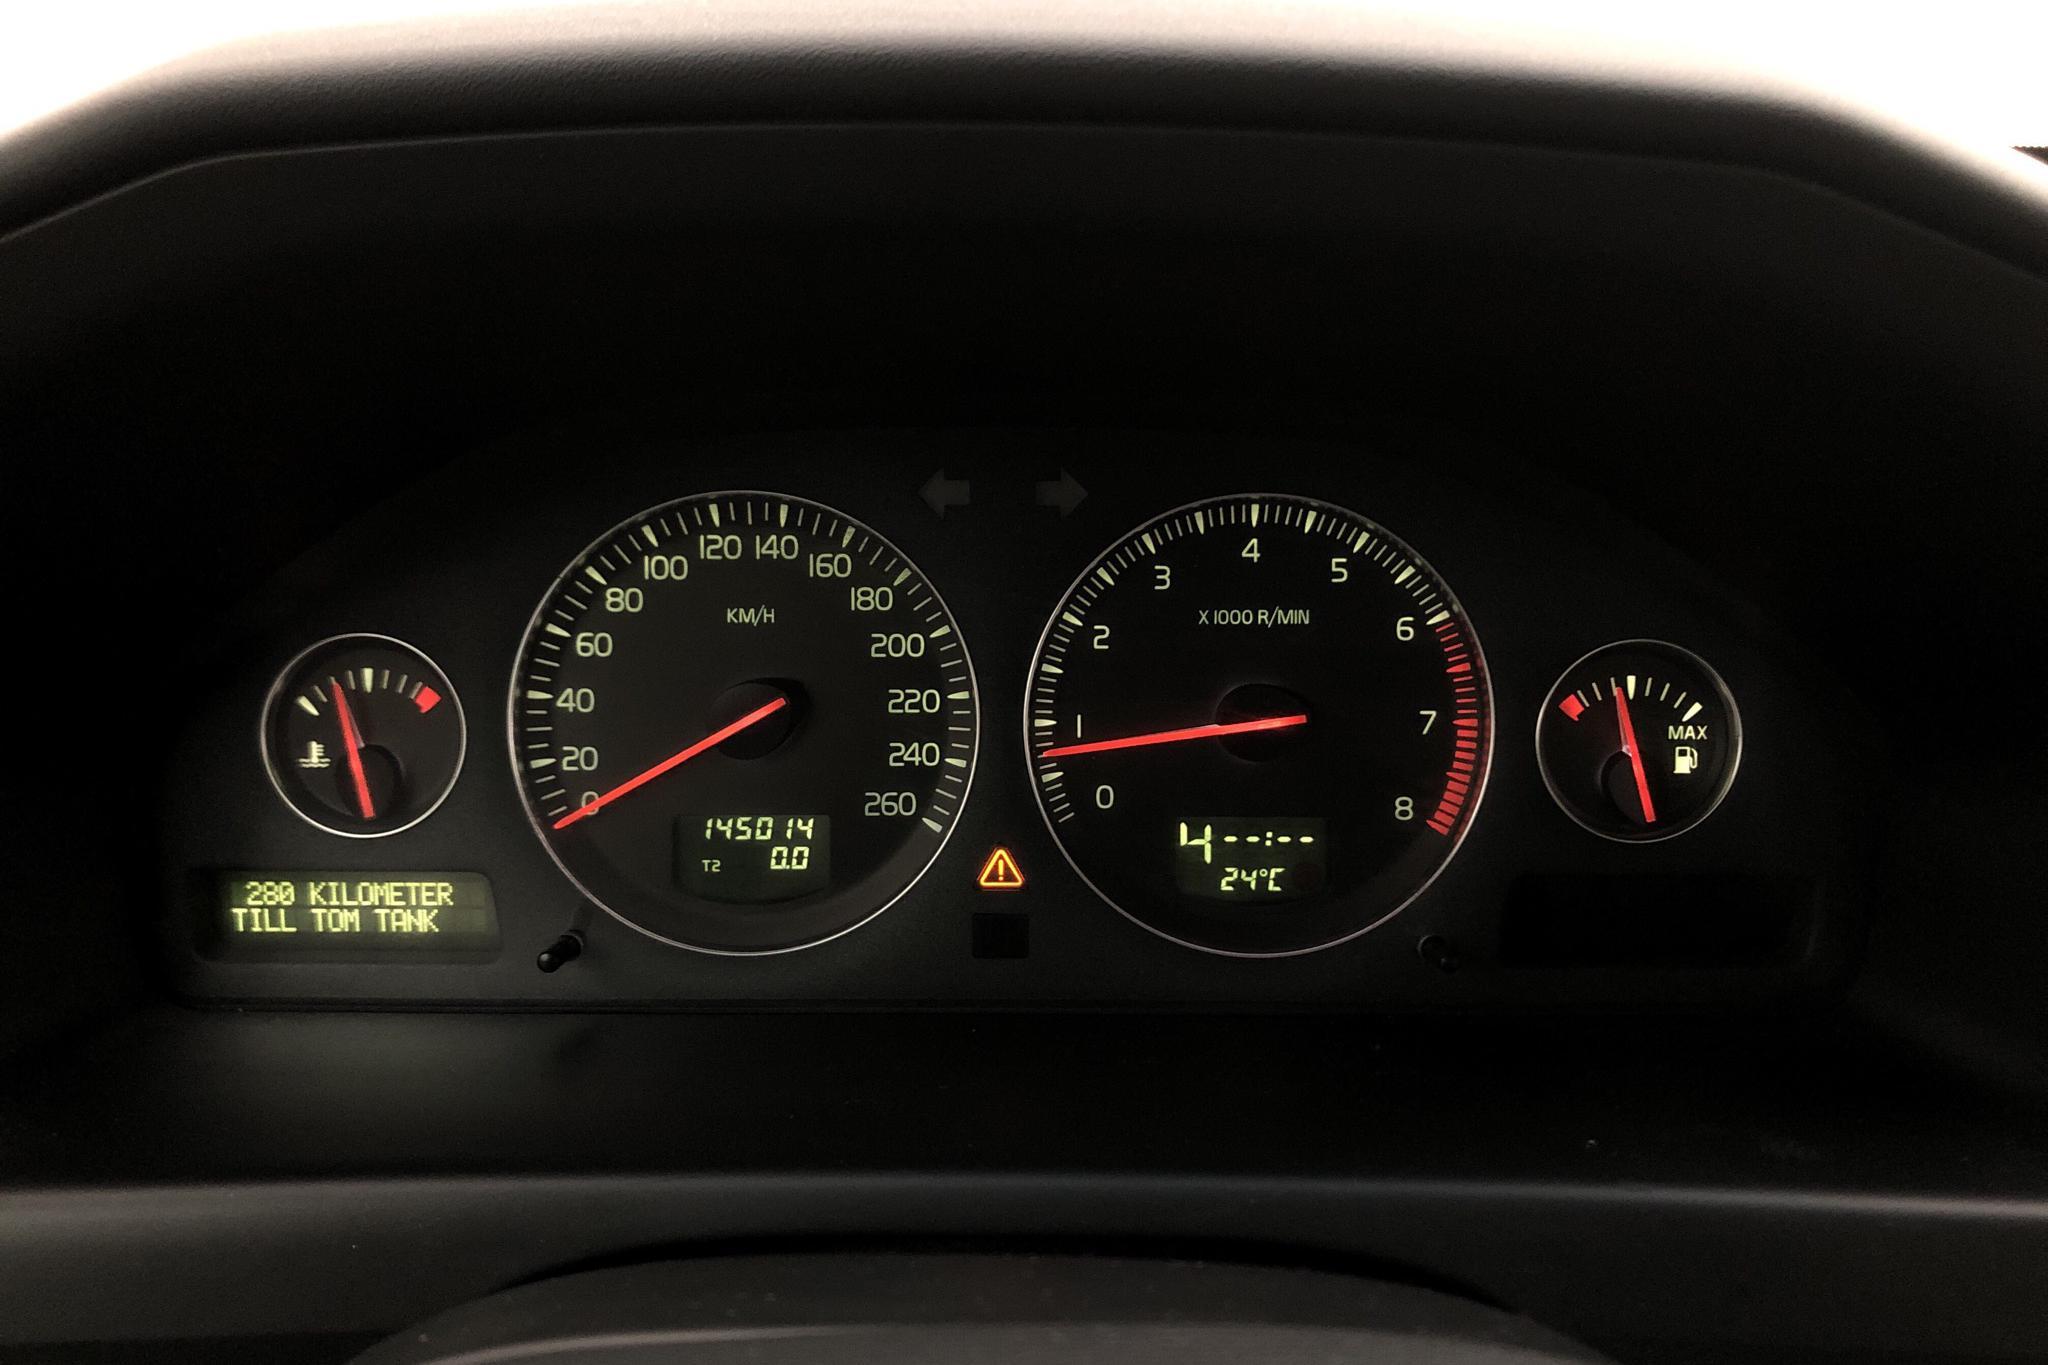 Volvo S60 2.5T (210hk) - 145 010 km - Automatic - gray - 2004